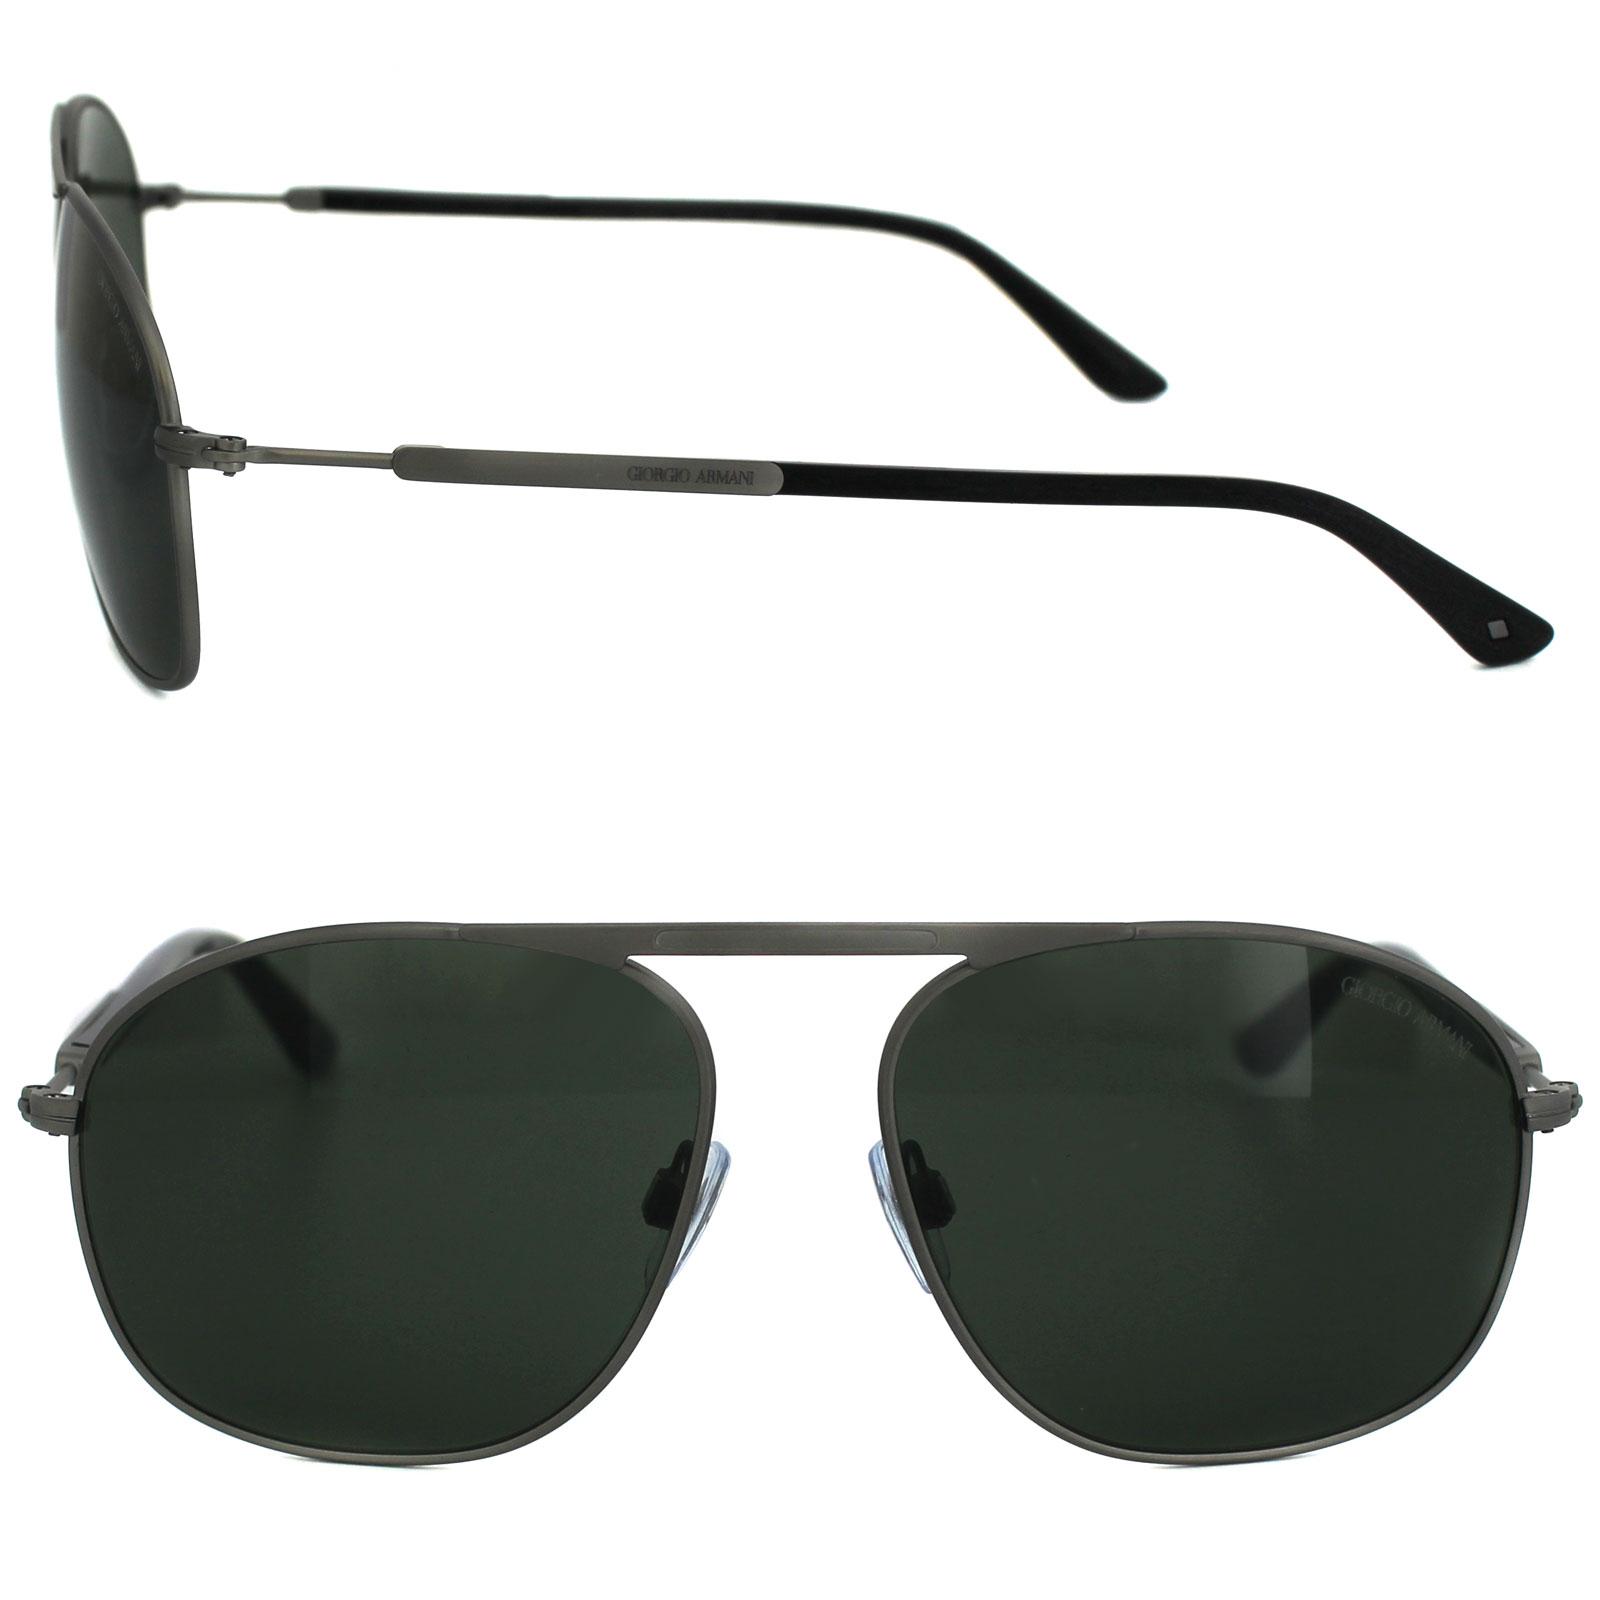 70d2a88cf7d6 Sentinel Thumbnail 2. Sentinel Giorgio Armani Sunglasses AR6015 303231 Matt  Brushed Ruthenium ...